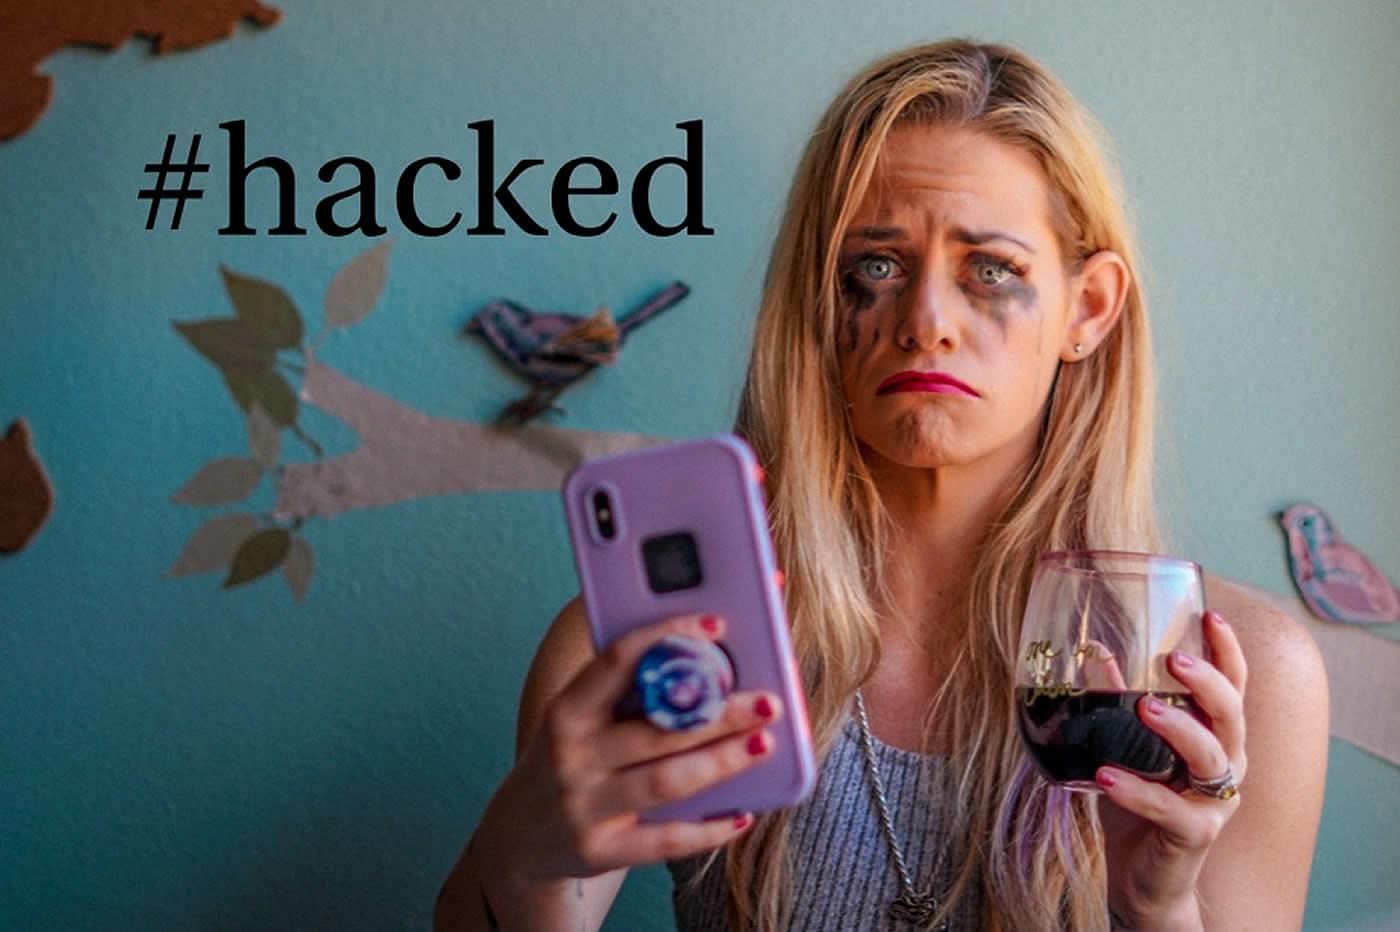 Lindsie Comerford influenceuse hackee